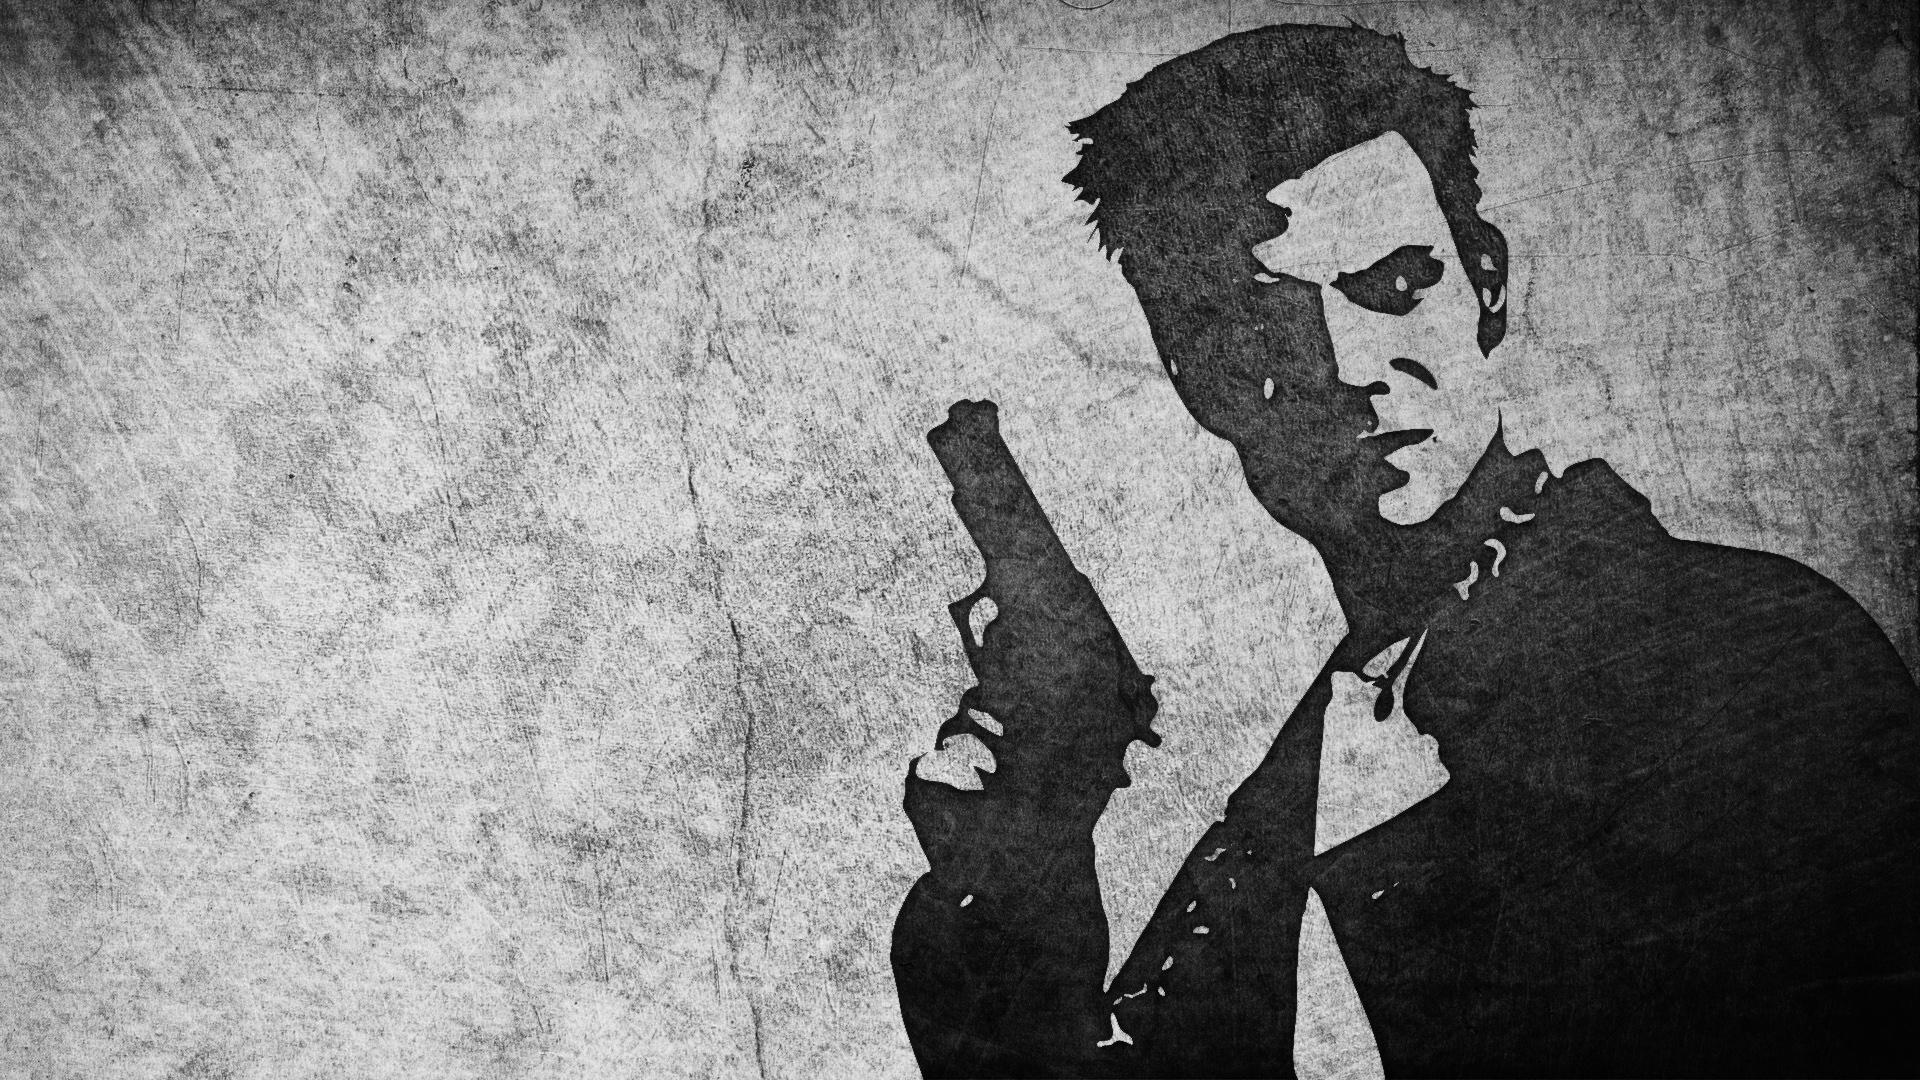 Арт к игре Max Payne